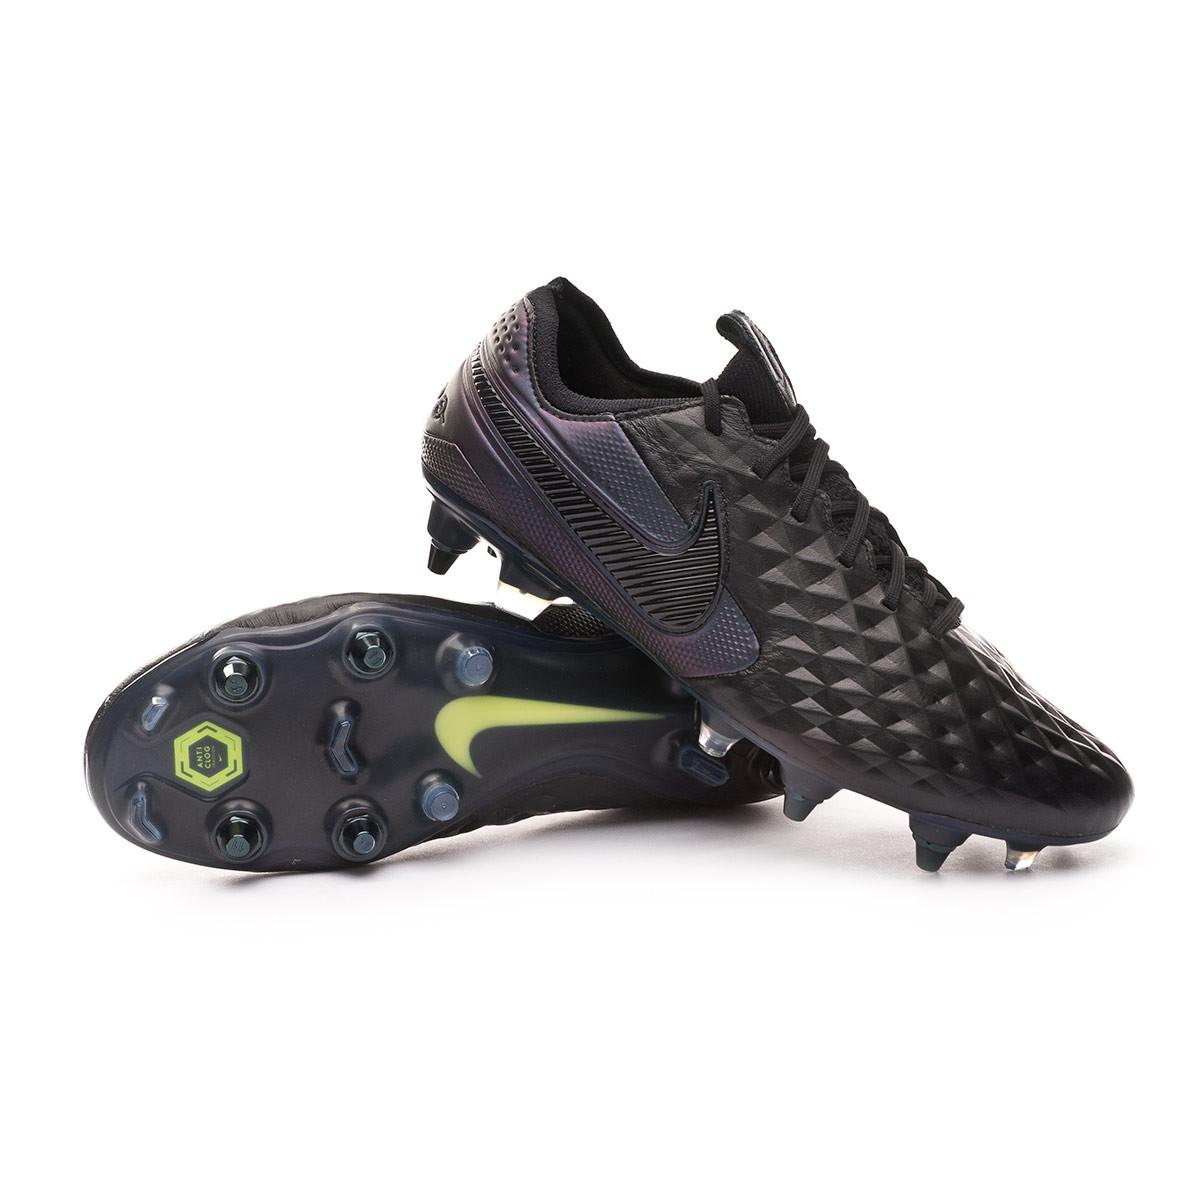 juguete director Glamour  Football Boots Nike Tiempo Legend VIII Elite SG-PRO Anti-Clog Traction Black  - Football store Fútbol Emotion